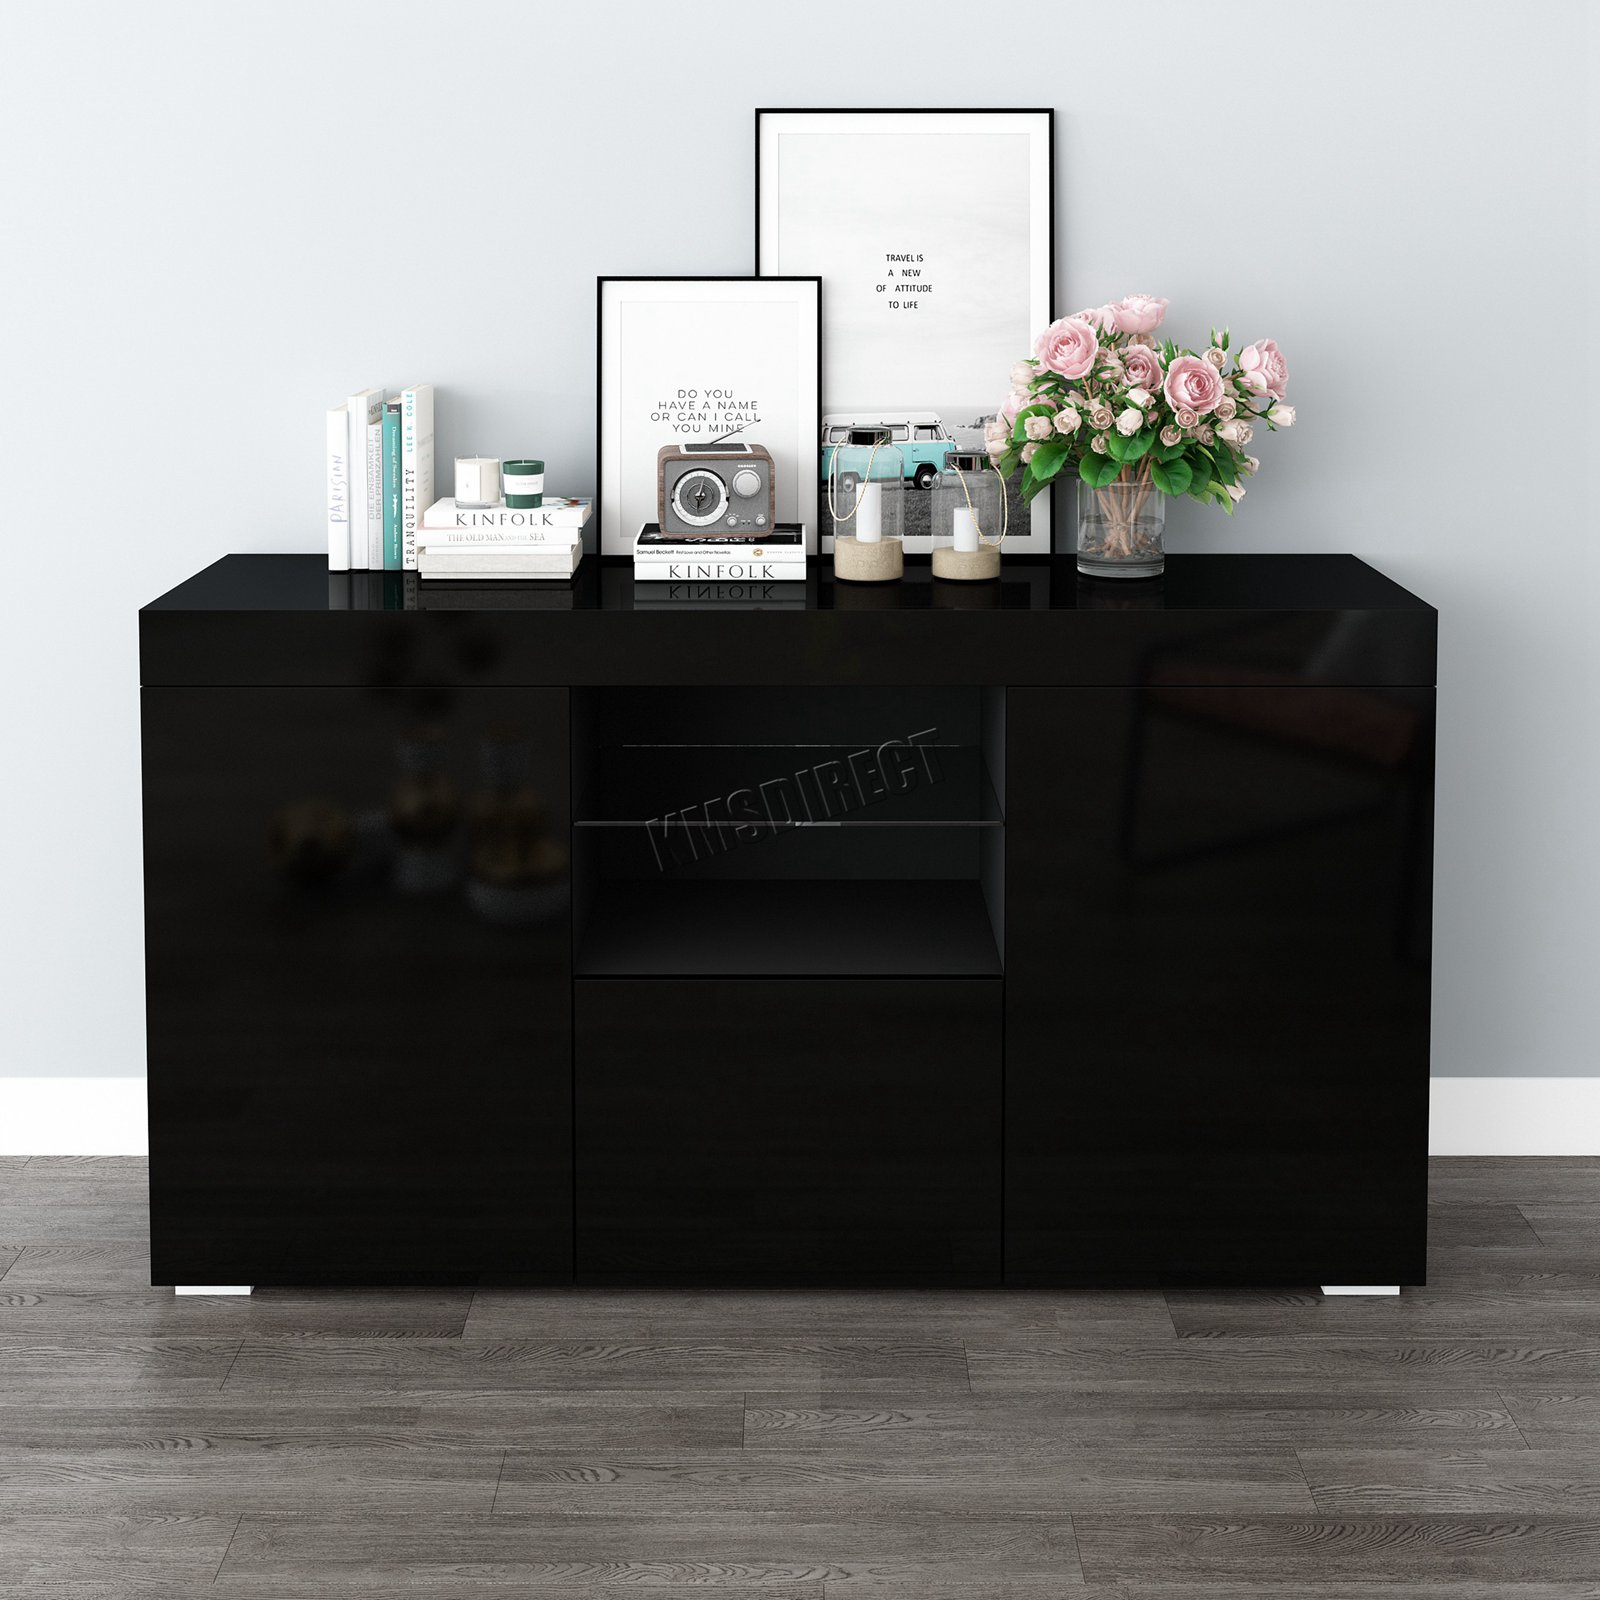 WestWood-PB-High-Gloss-Cabinet-LED-Bookshelf-Sideboard-Cupboard-Home-Unit-PHC03 thumbnail 18